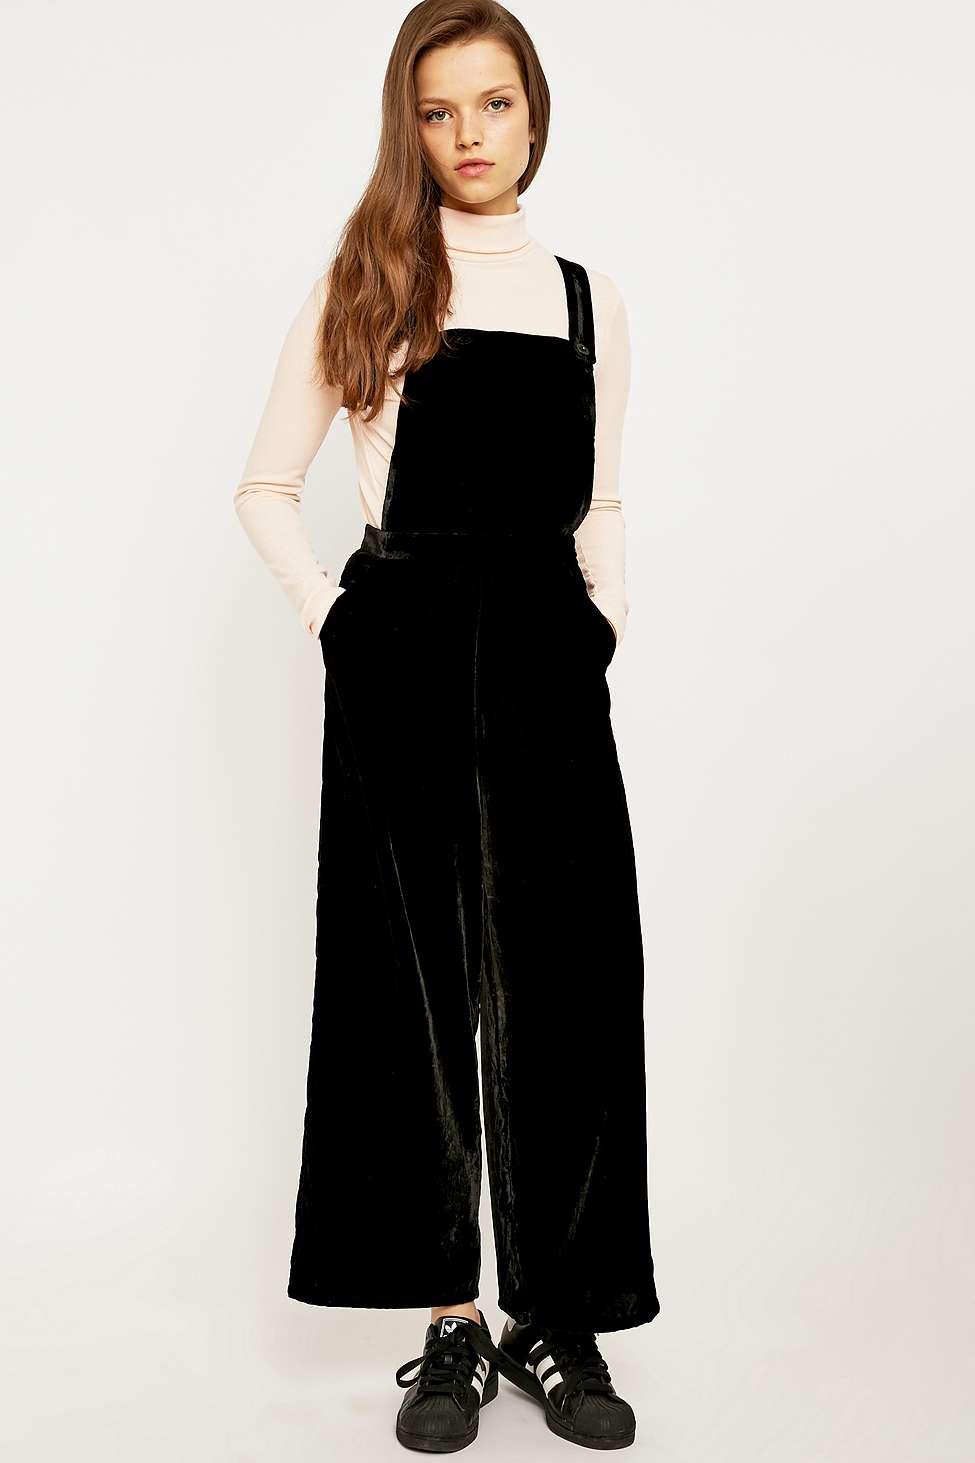 2d3ec6a9d3c Urban Outfitters Velvet Pinafore Jumpsuit in Black - Lyst